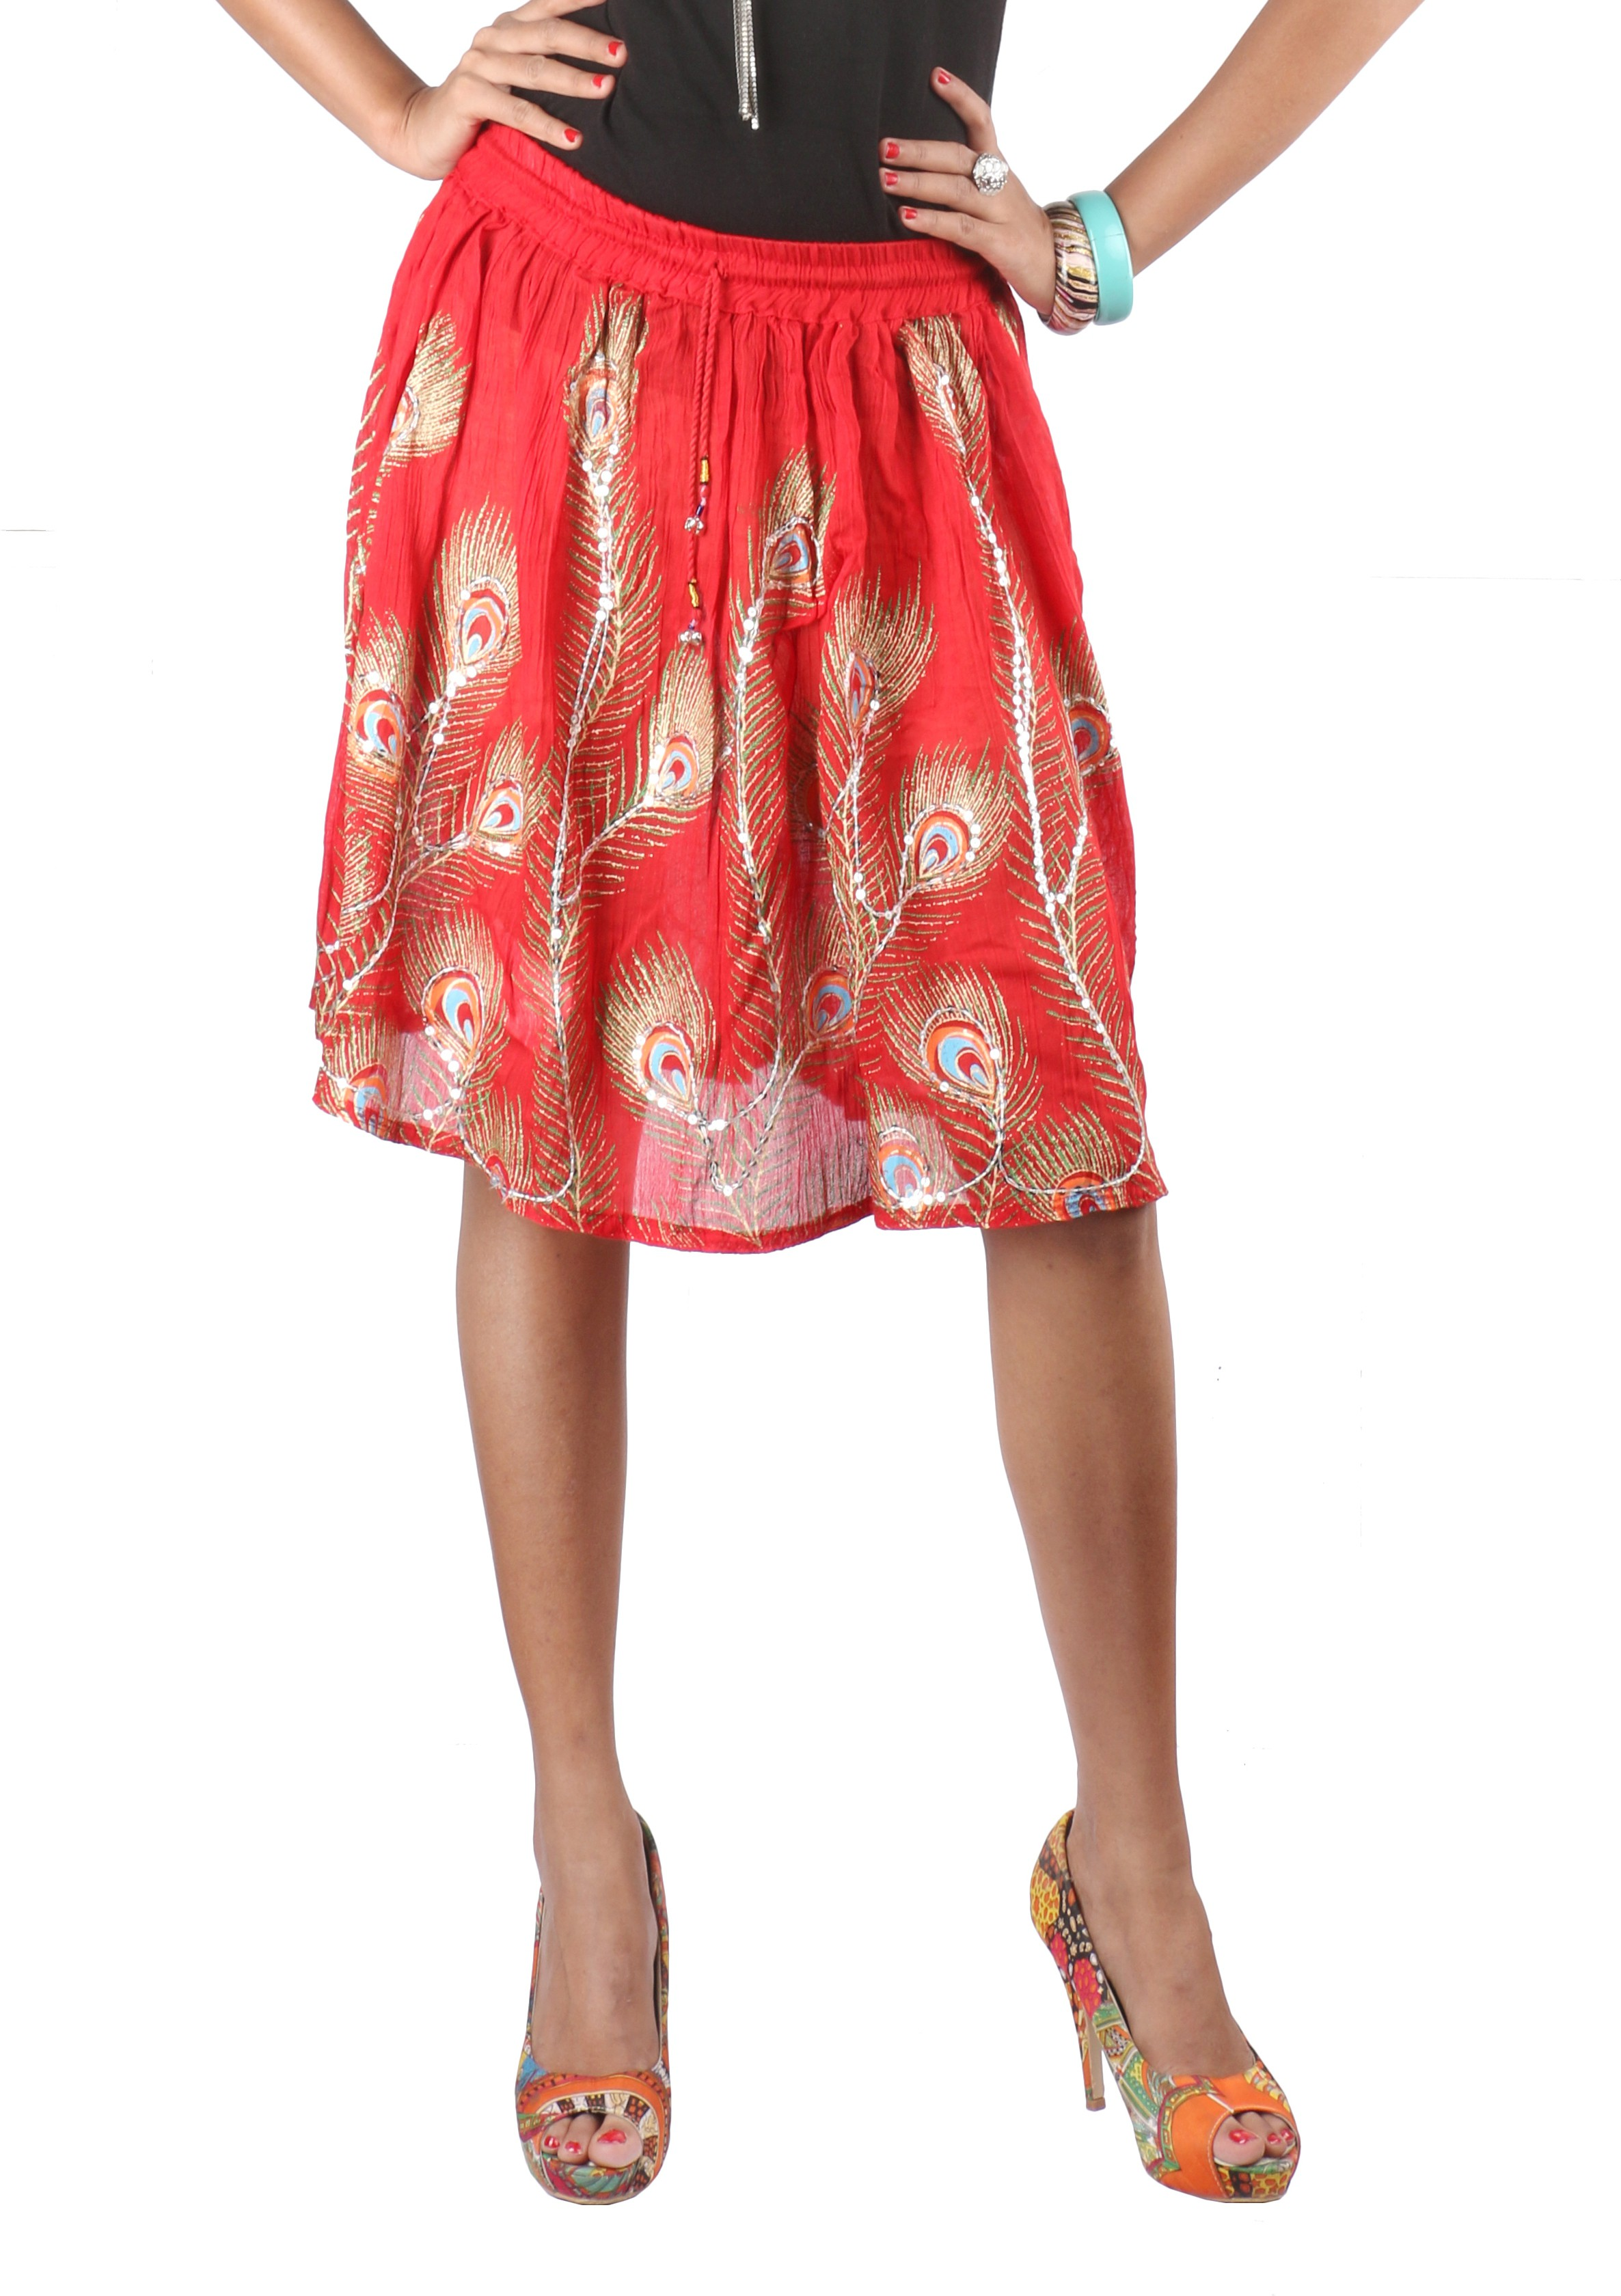 Indiankala4u Printed Womens Broomstick Red Skirt